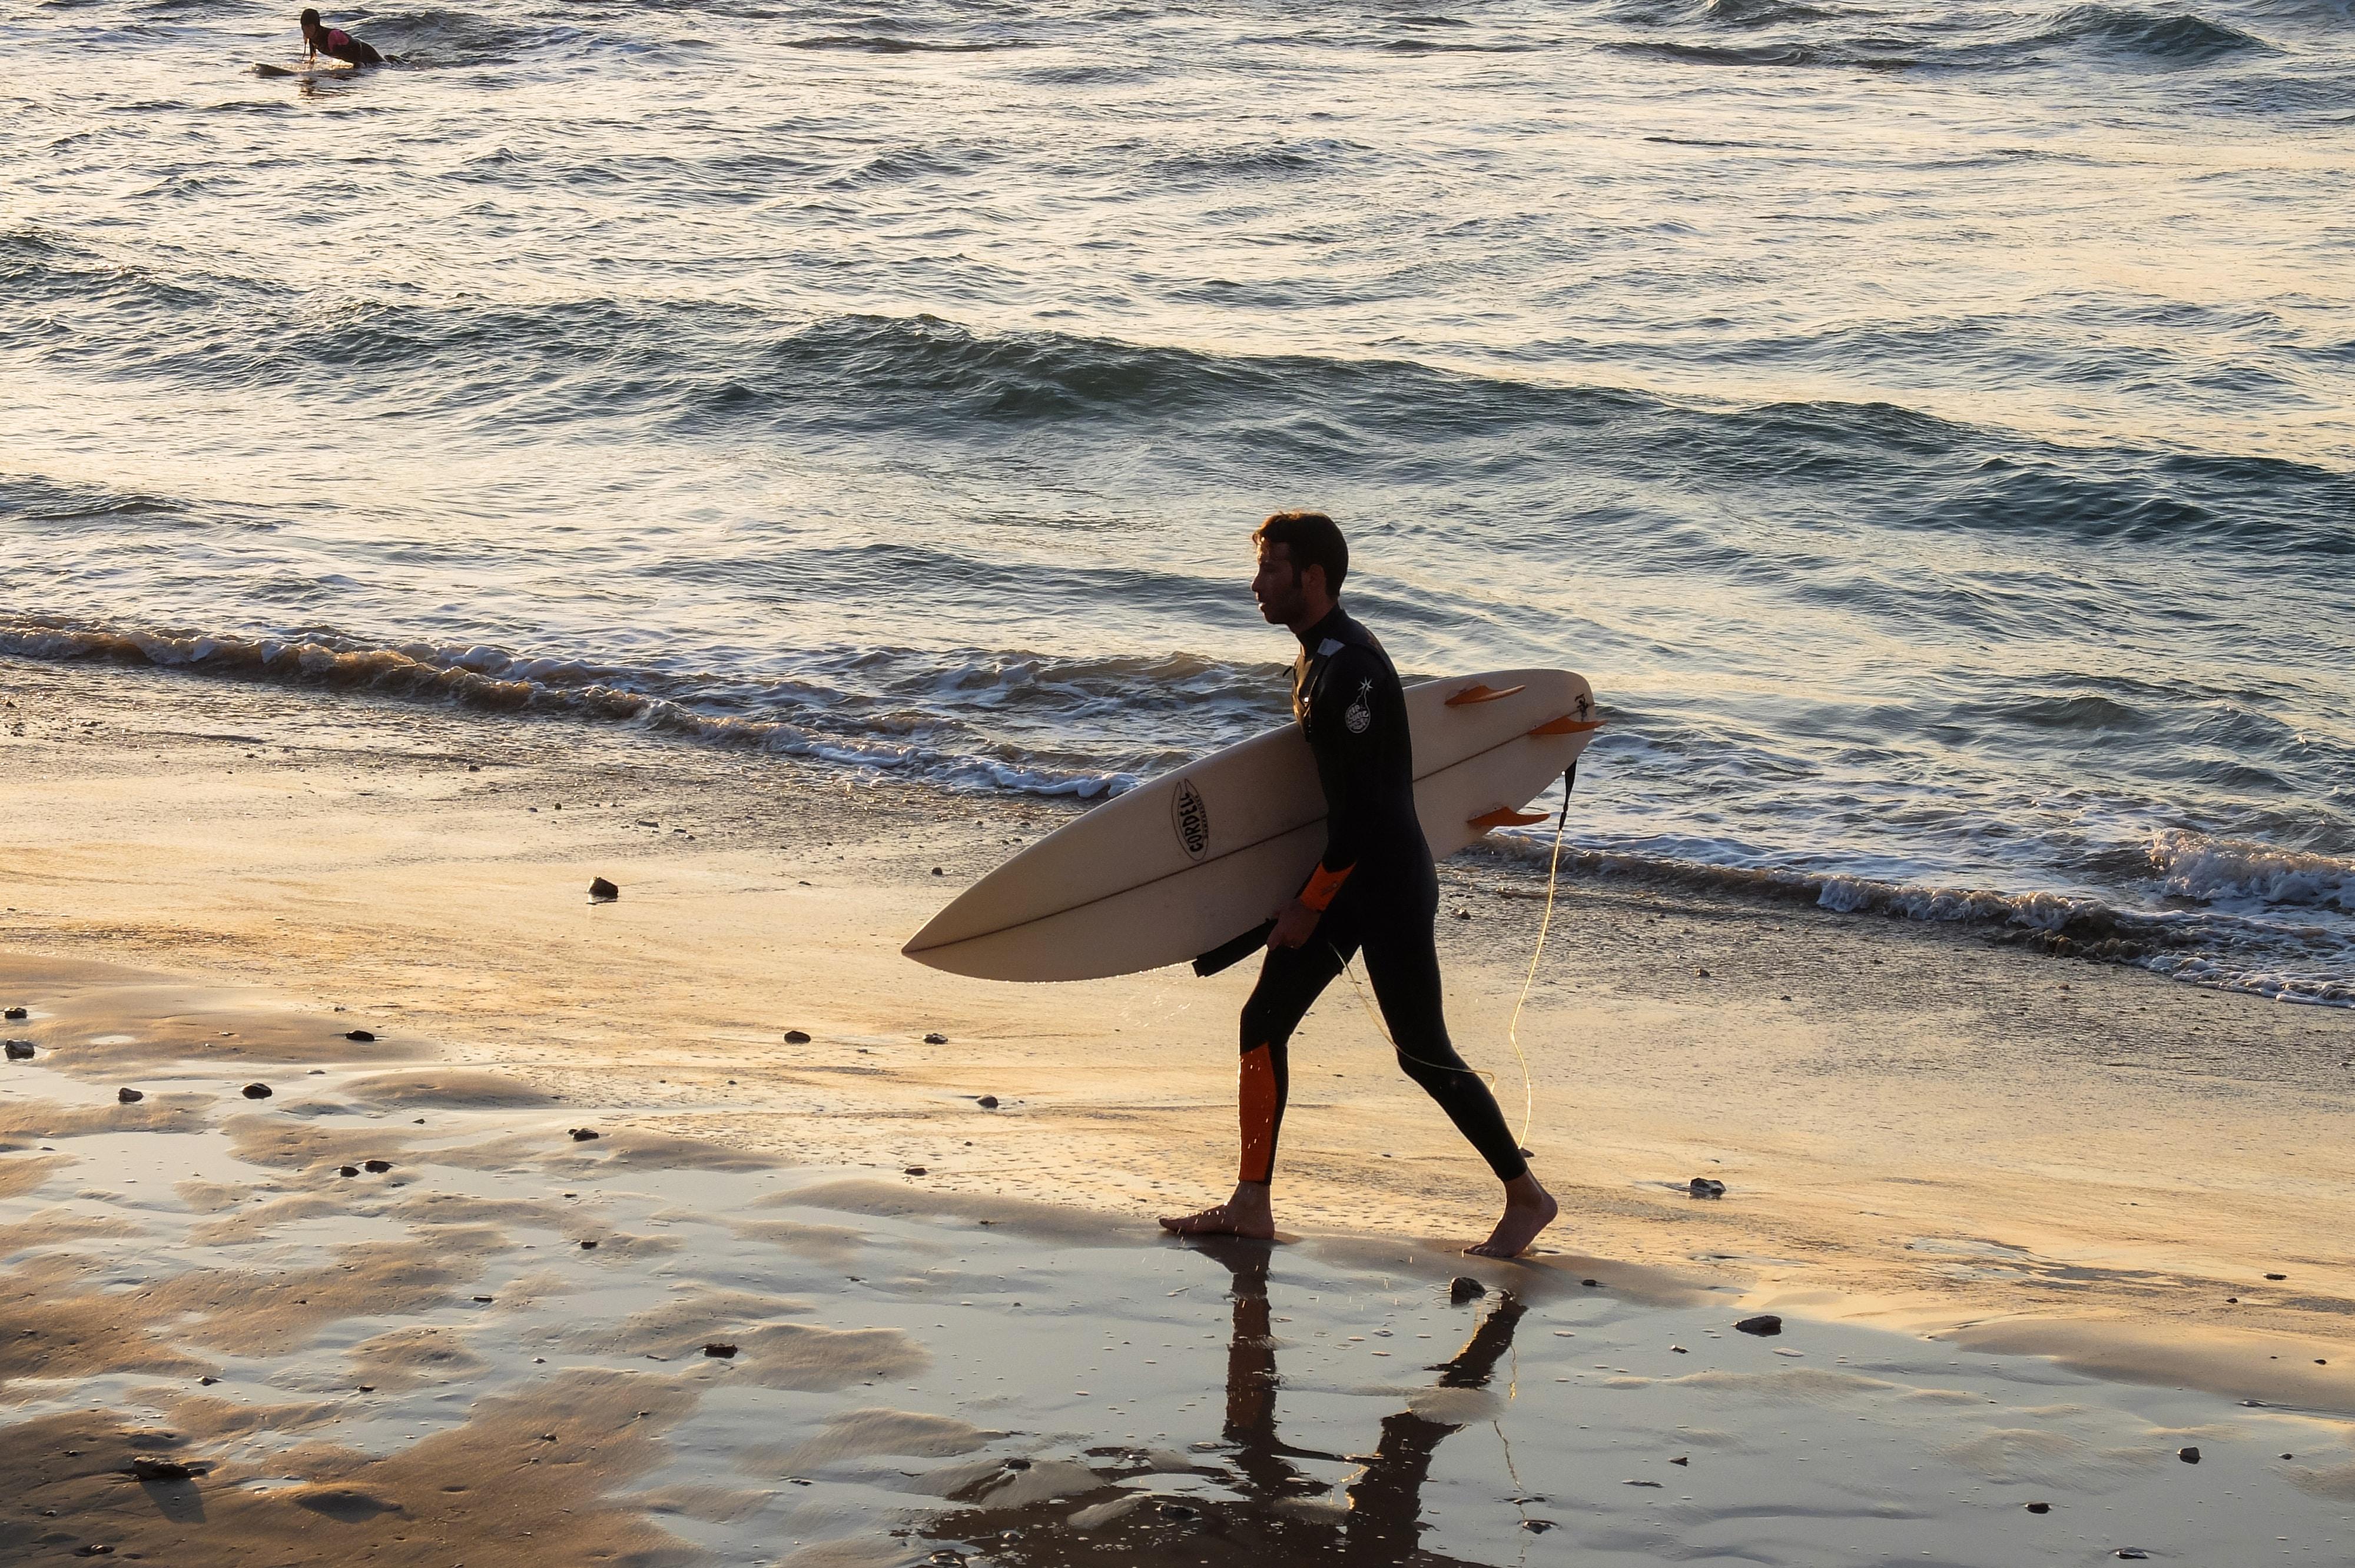 man carrying surfboard while walking on seashore at daytime